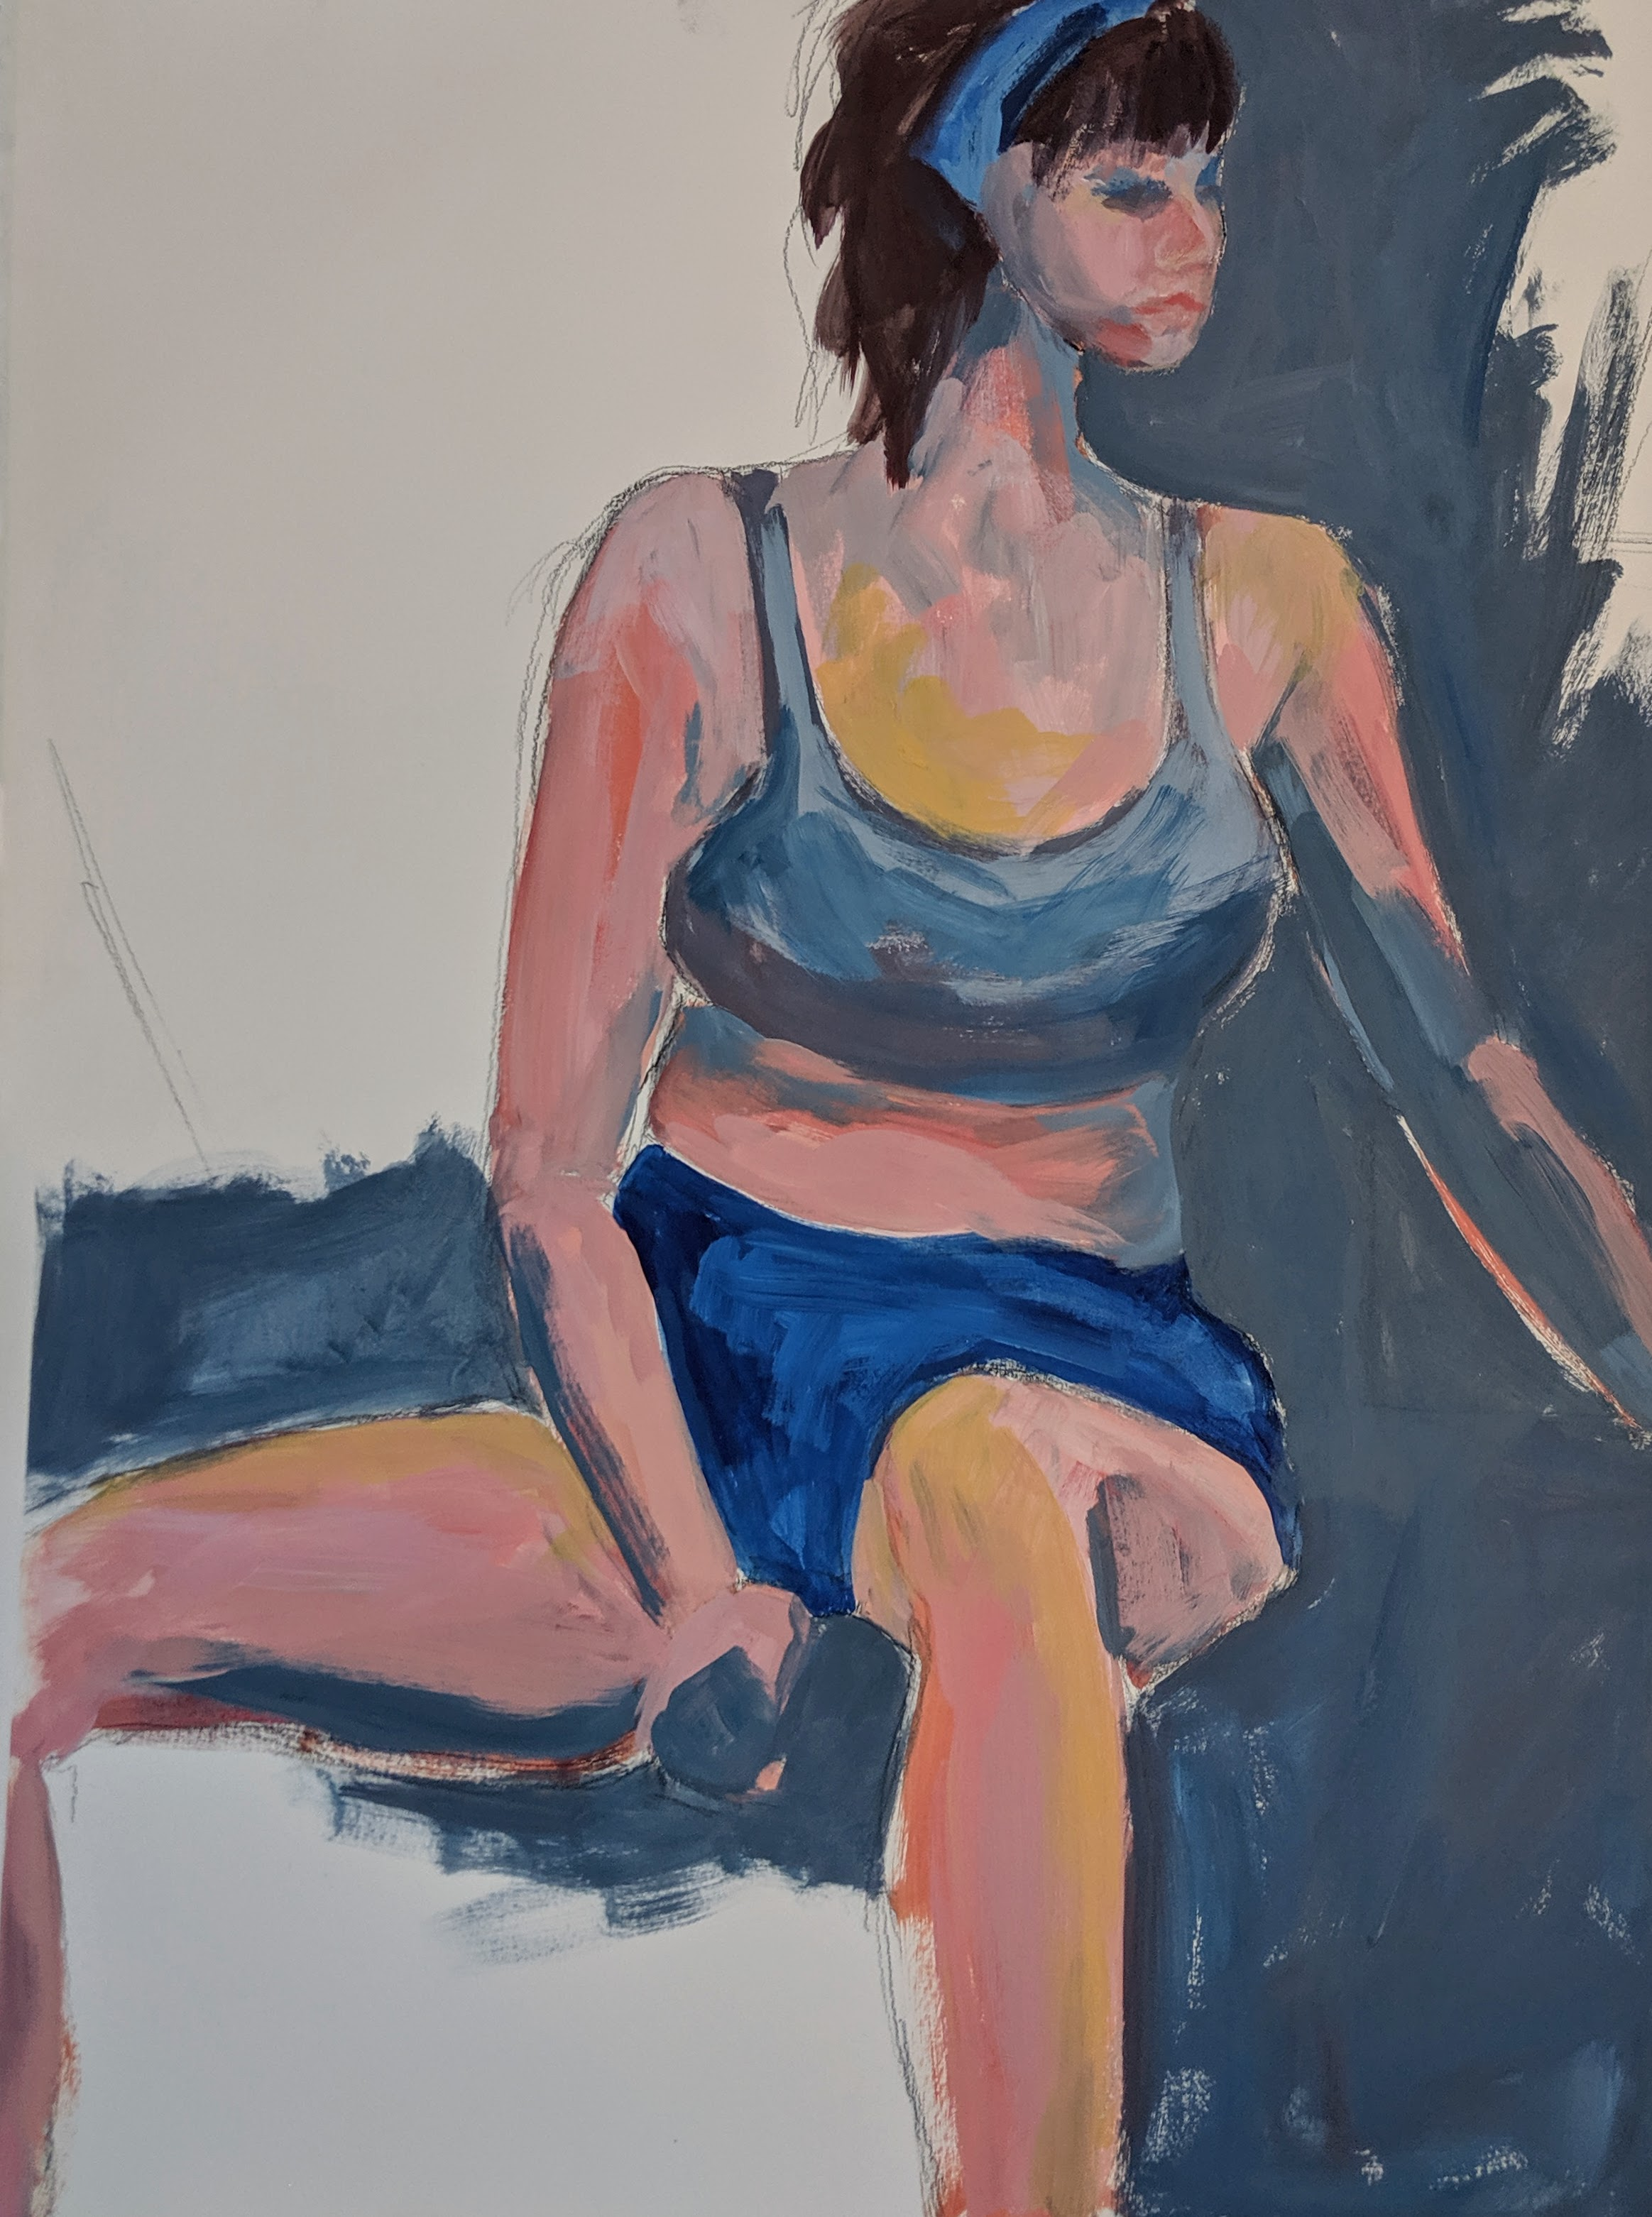 ©2019 Lois Reinis  | Figure Painting & Drawing Workshop, San Luis Obispo County (Arroyo Grande, CA) | David Limrite, Instructor